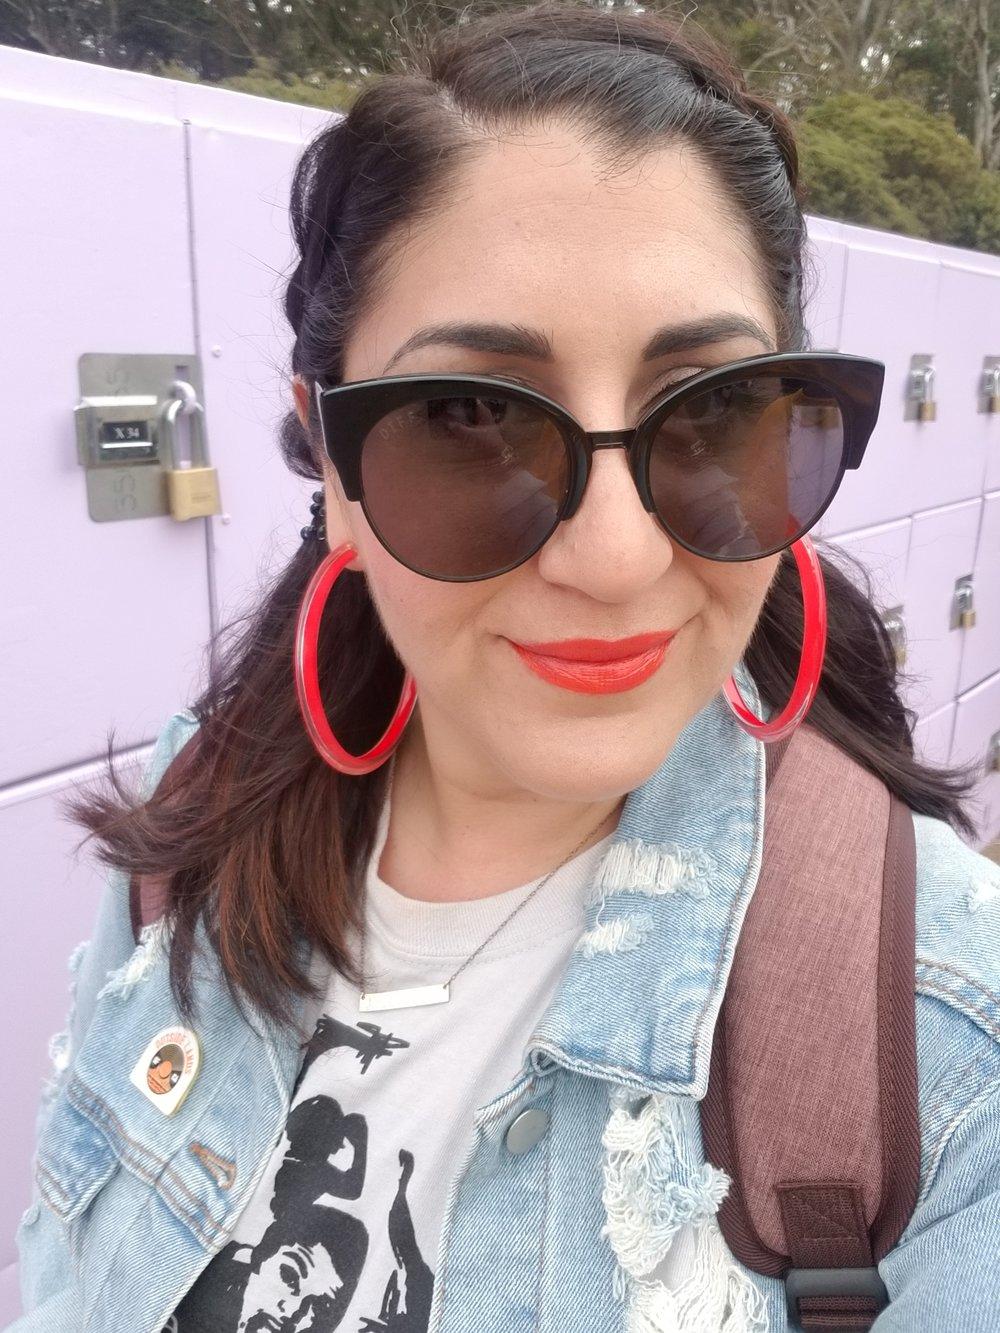 <<<< OSL 2018 - *Sunglass: Diff Eyewearin